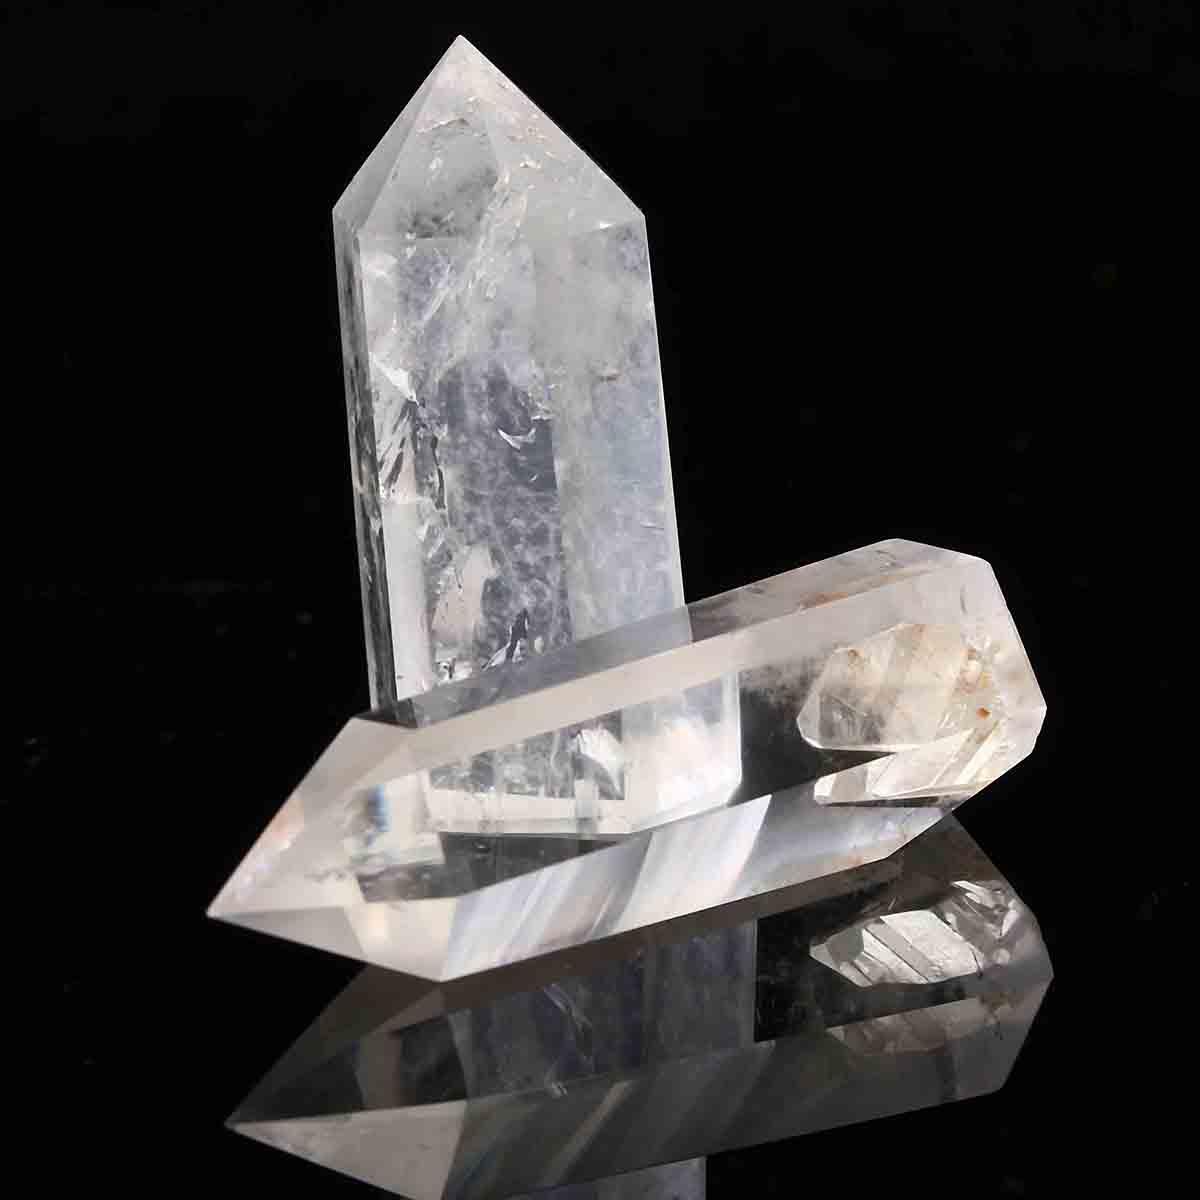 2pcs Transparent Clear Healing Seed Rock Quartz Crystal Wand Decoration